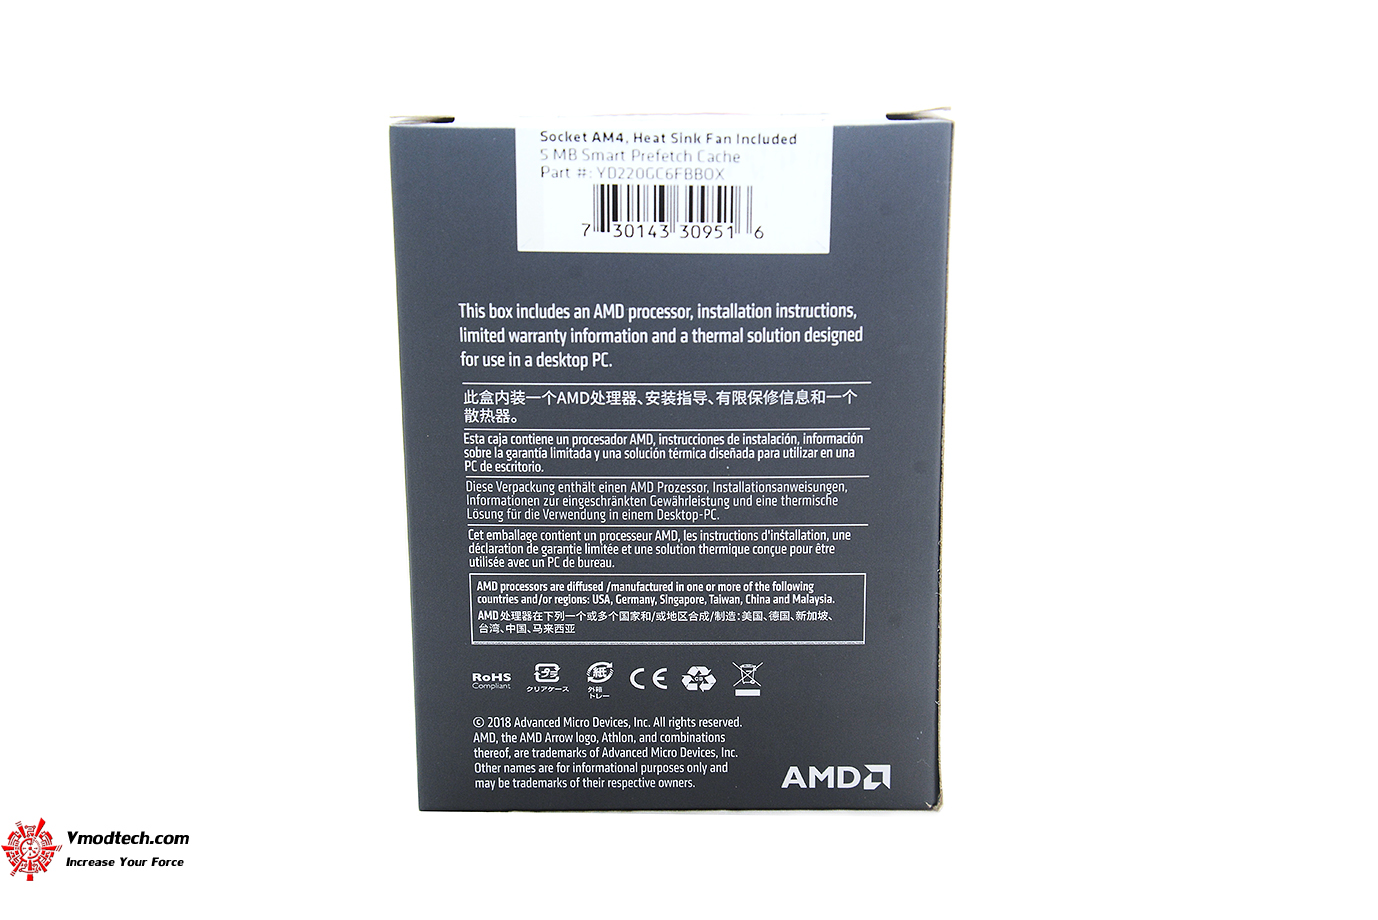 dsc 9661 AMD Athlon 220GE Processor with Radeon Vega 3 Graphics Review